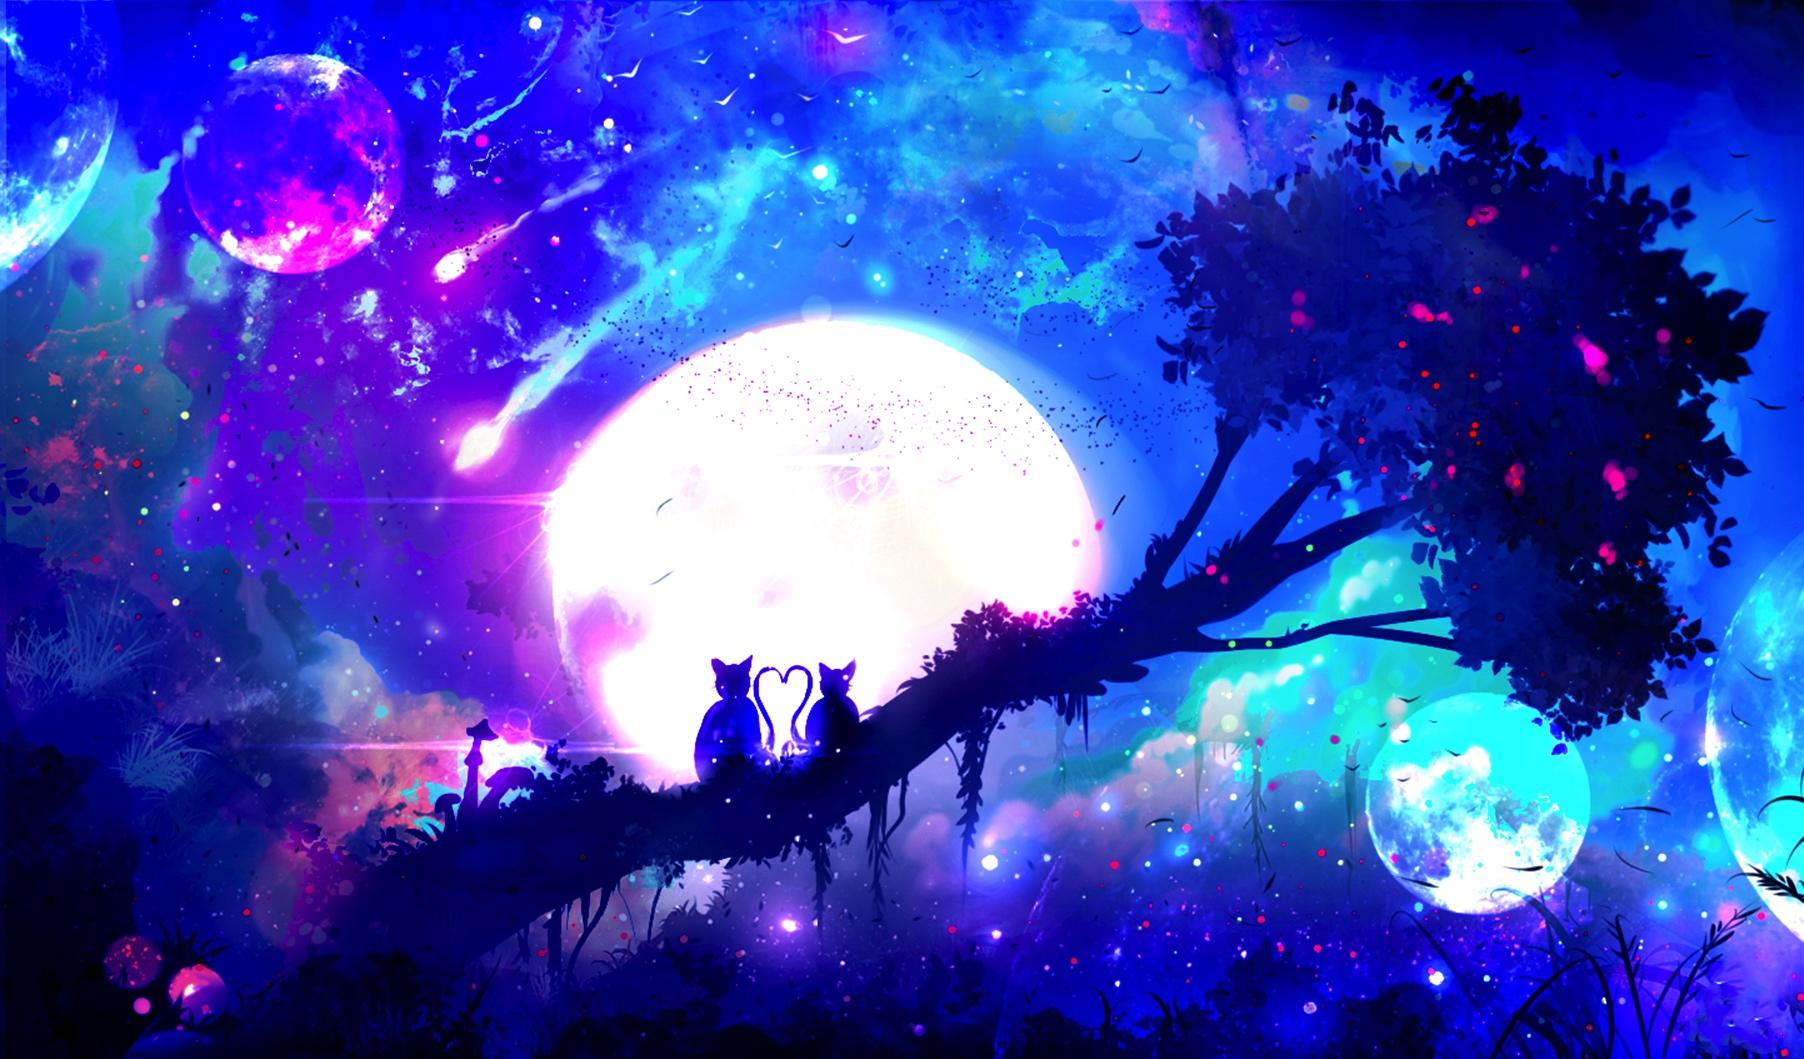 Wallpaper Monkey, pair, night, tree, anime, original, moon, art